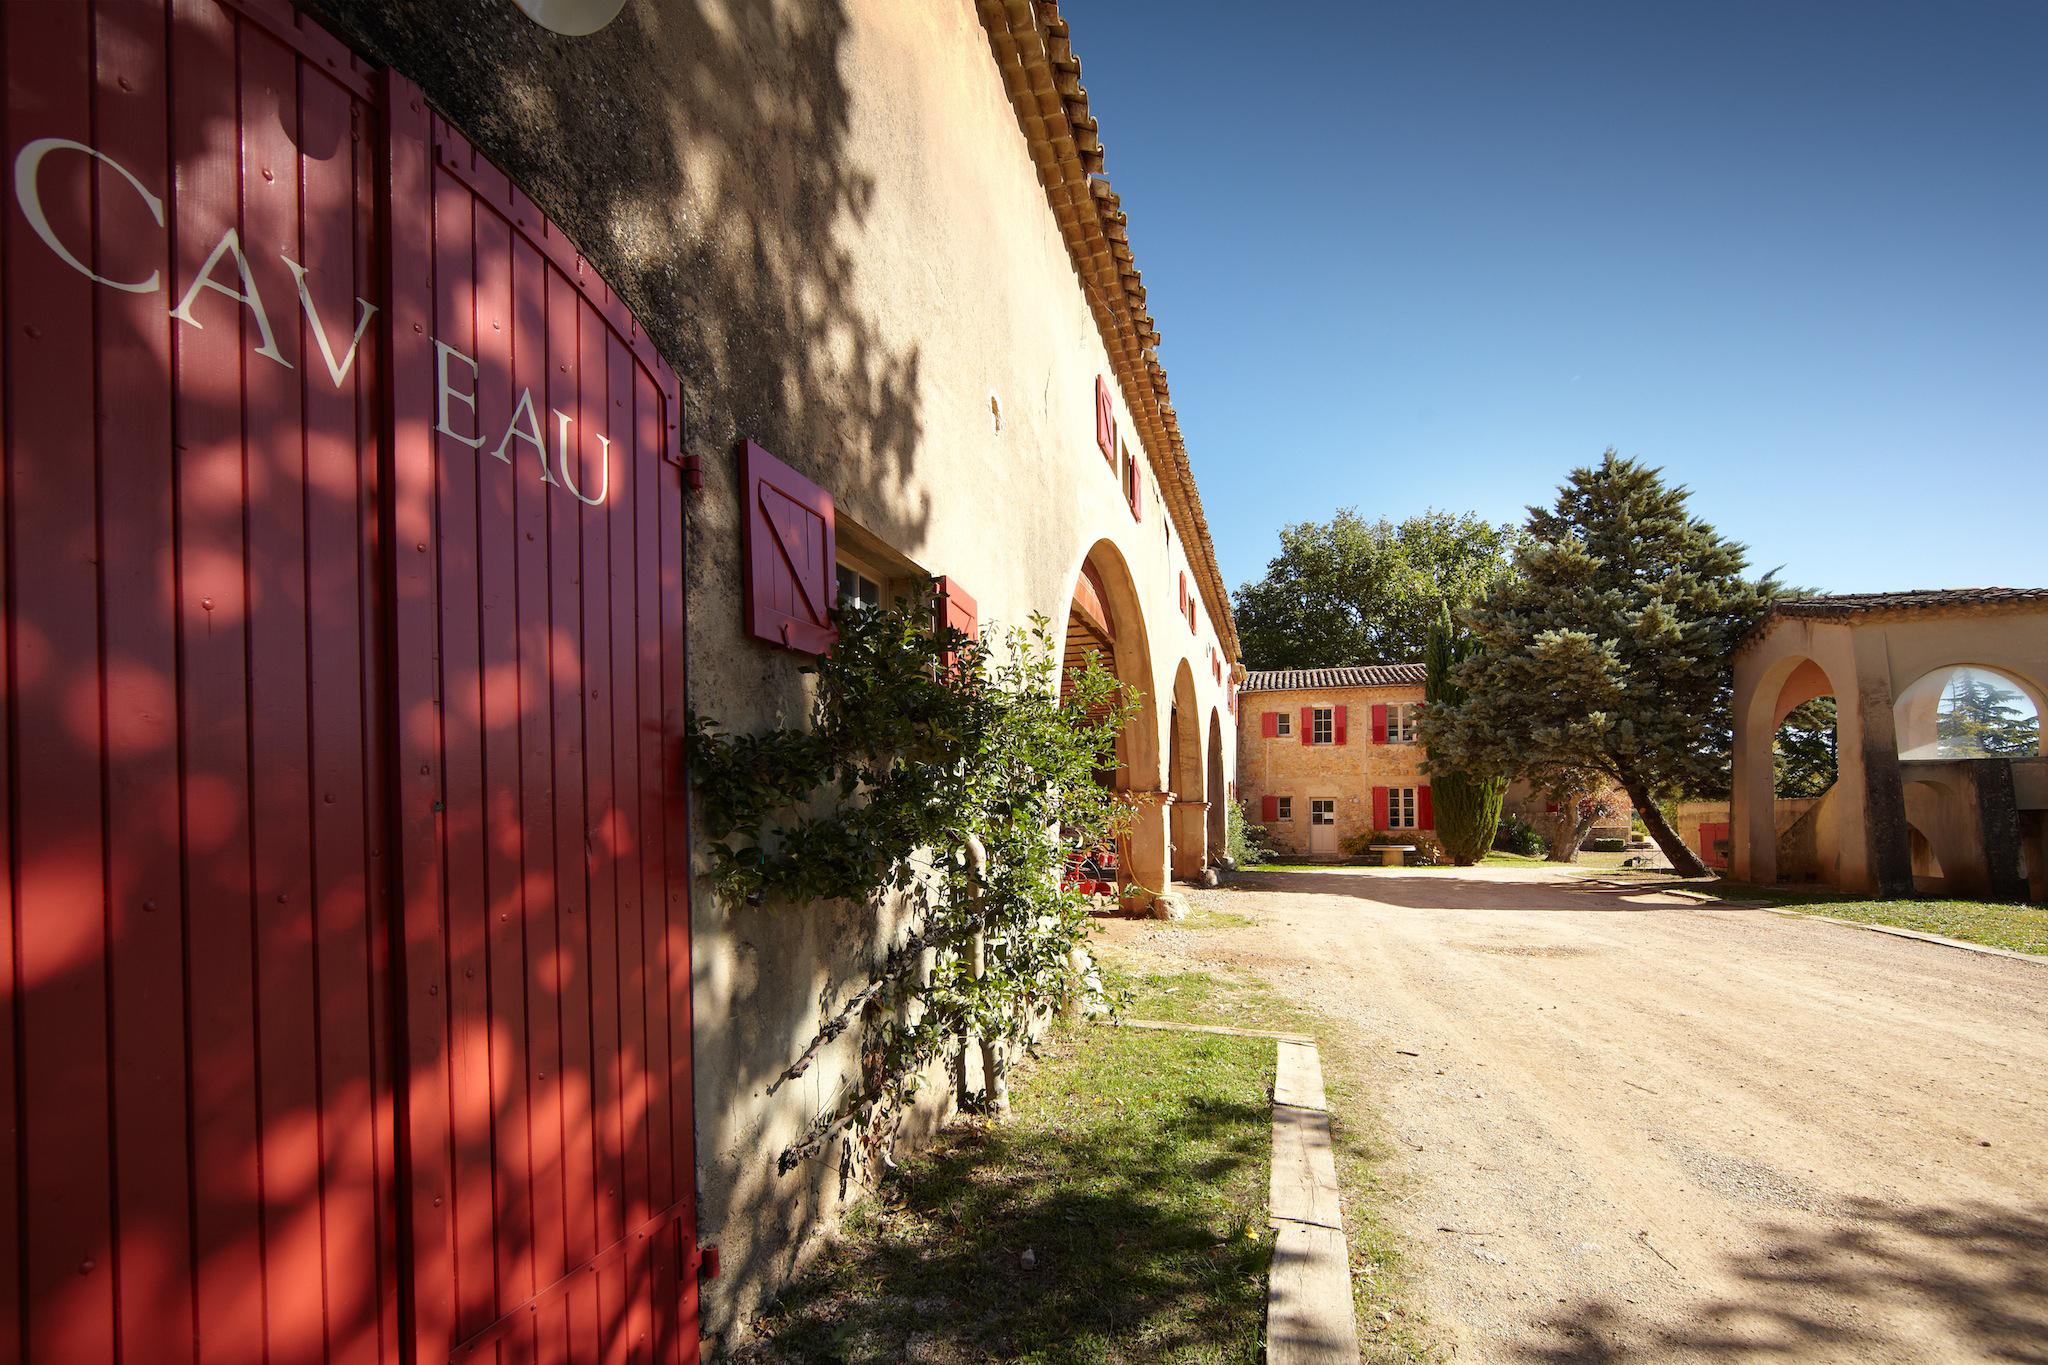 Brad Pitt & Angelina Jolie's Château Miraval Vineyard to Launch New Rosé 7